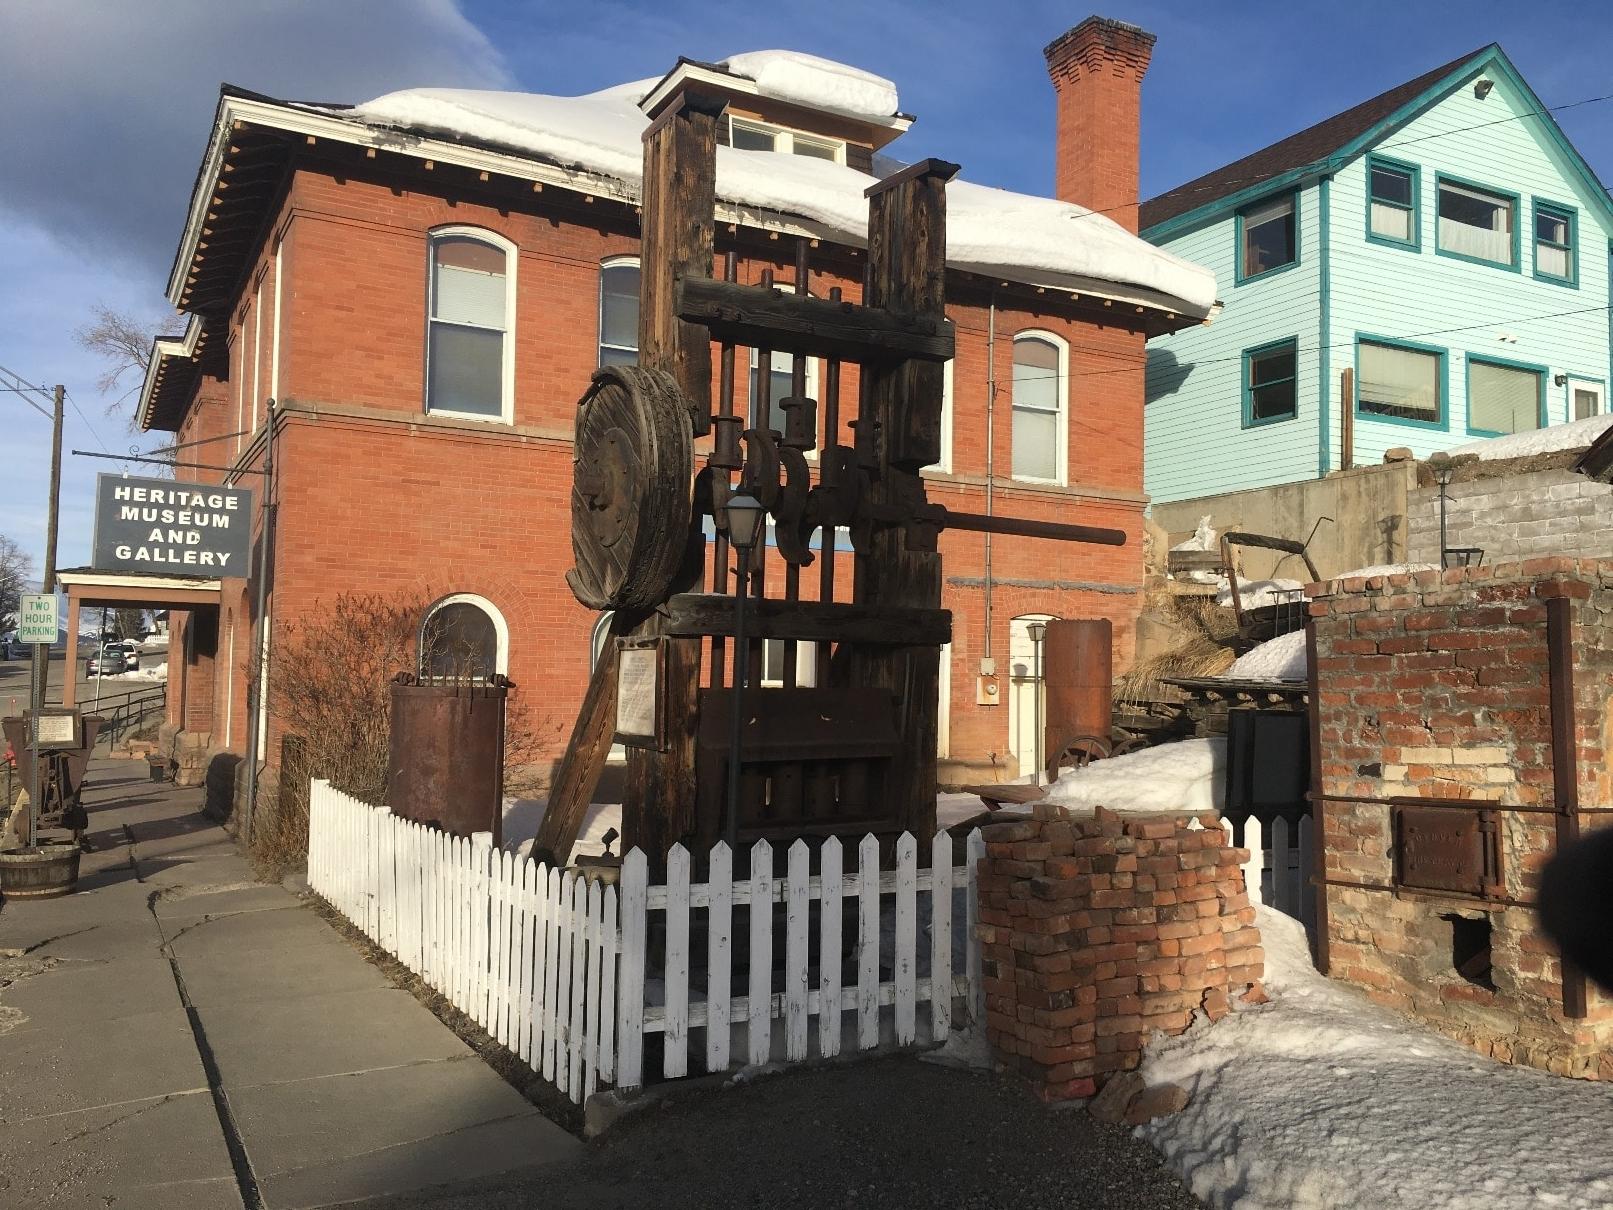 Leadville Heritage Museum